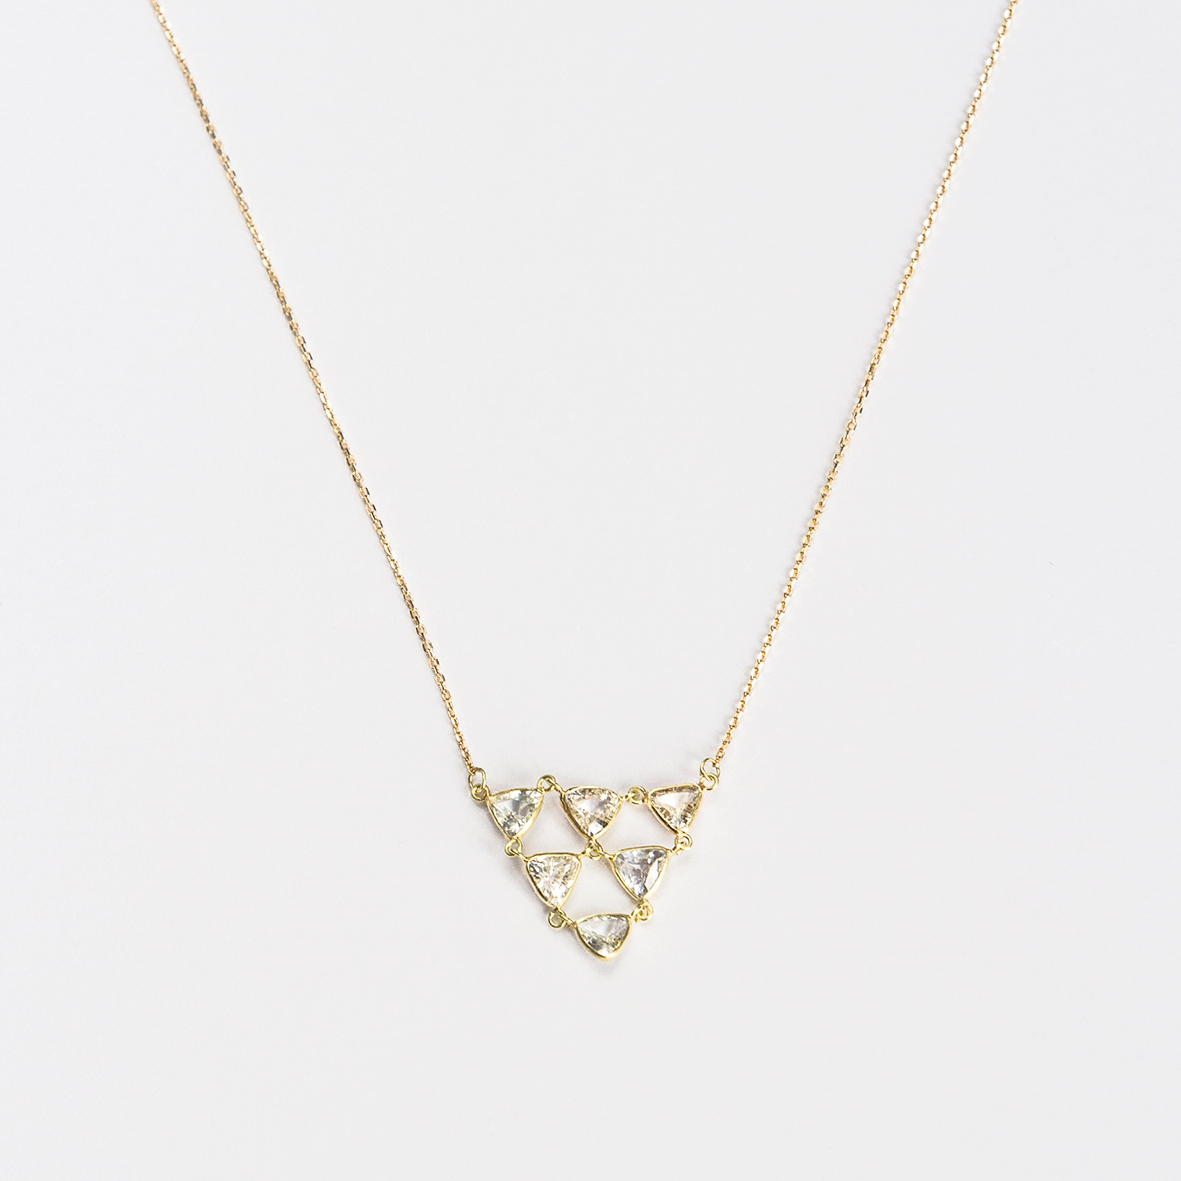 1. OONA_philo_ficha1_sapphire triangles cascade necklace